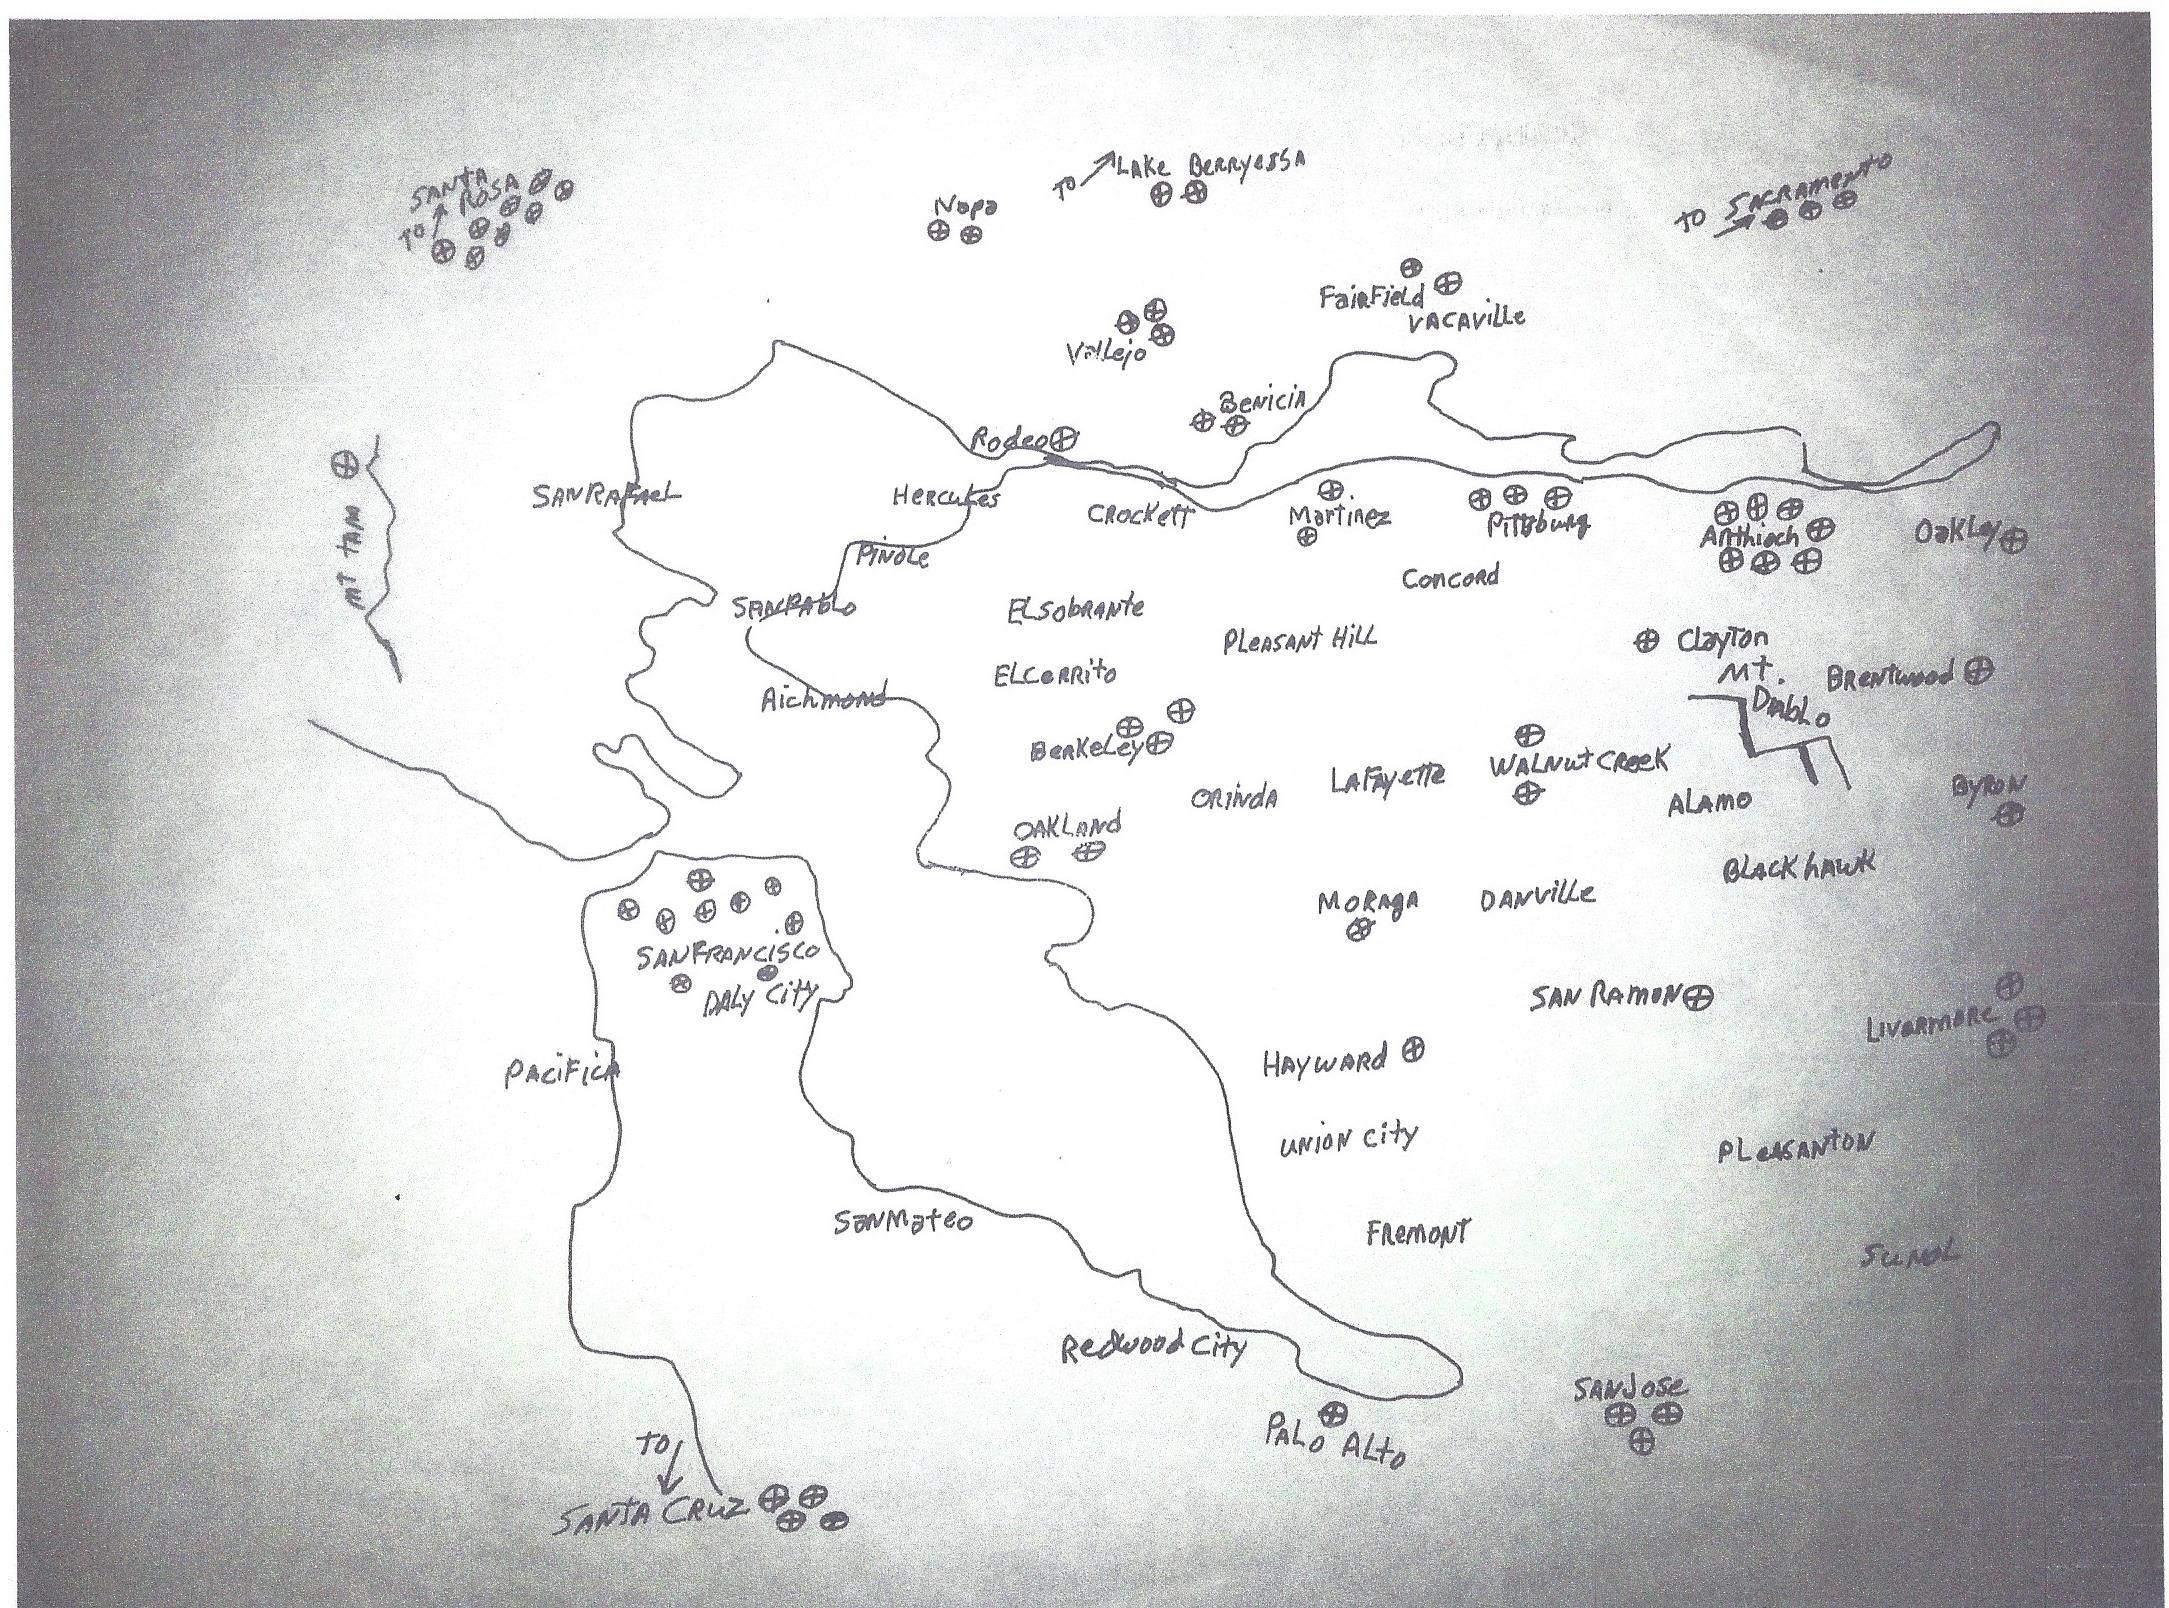 1980s Murder Map 77 Victims.jpg